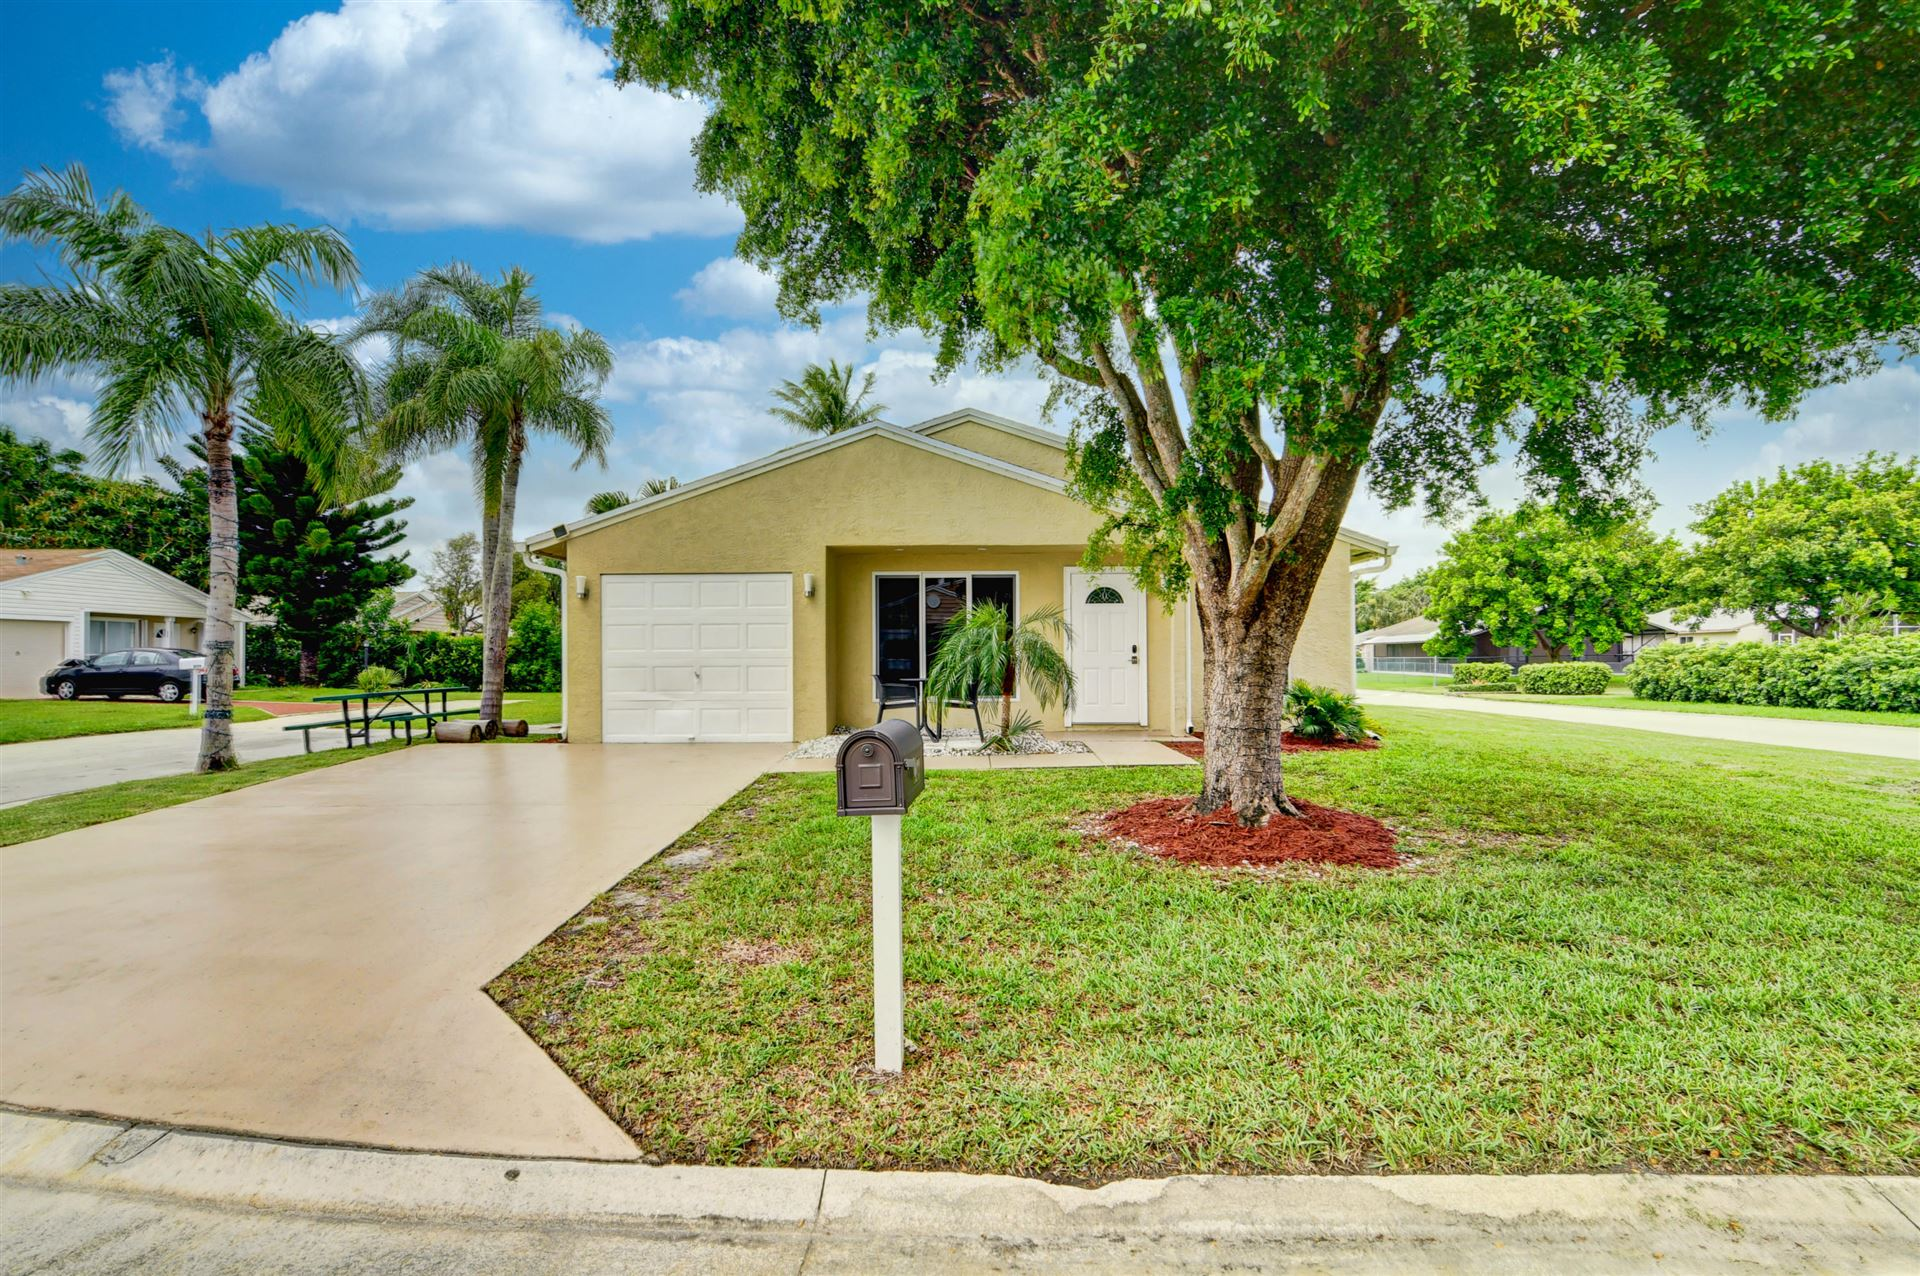 8233 Cedar Hollow Lane, Boca Raton, FL 33433 - #: RX-10730954